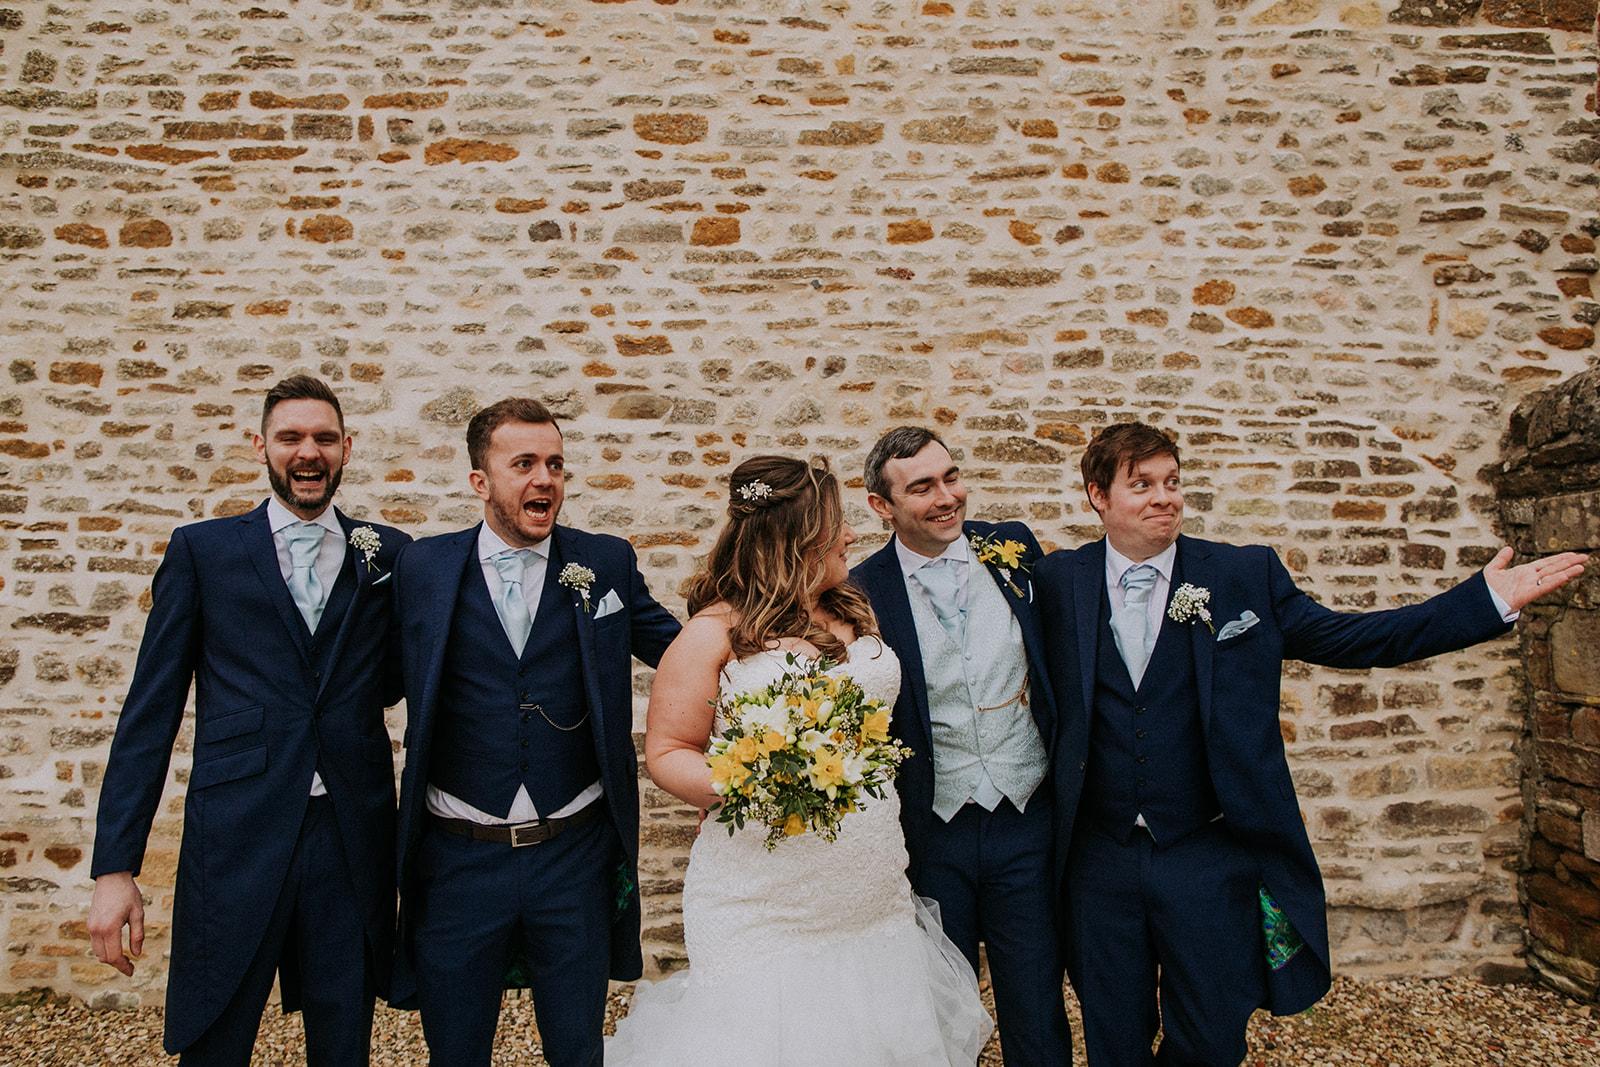 bride with groomsmen - rutland wedding - fun wedding - east midlands wedding planner - Leicestershire wedding planning - nottingham wedding planner